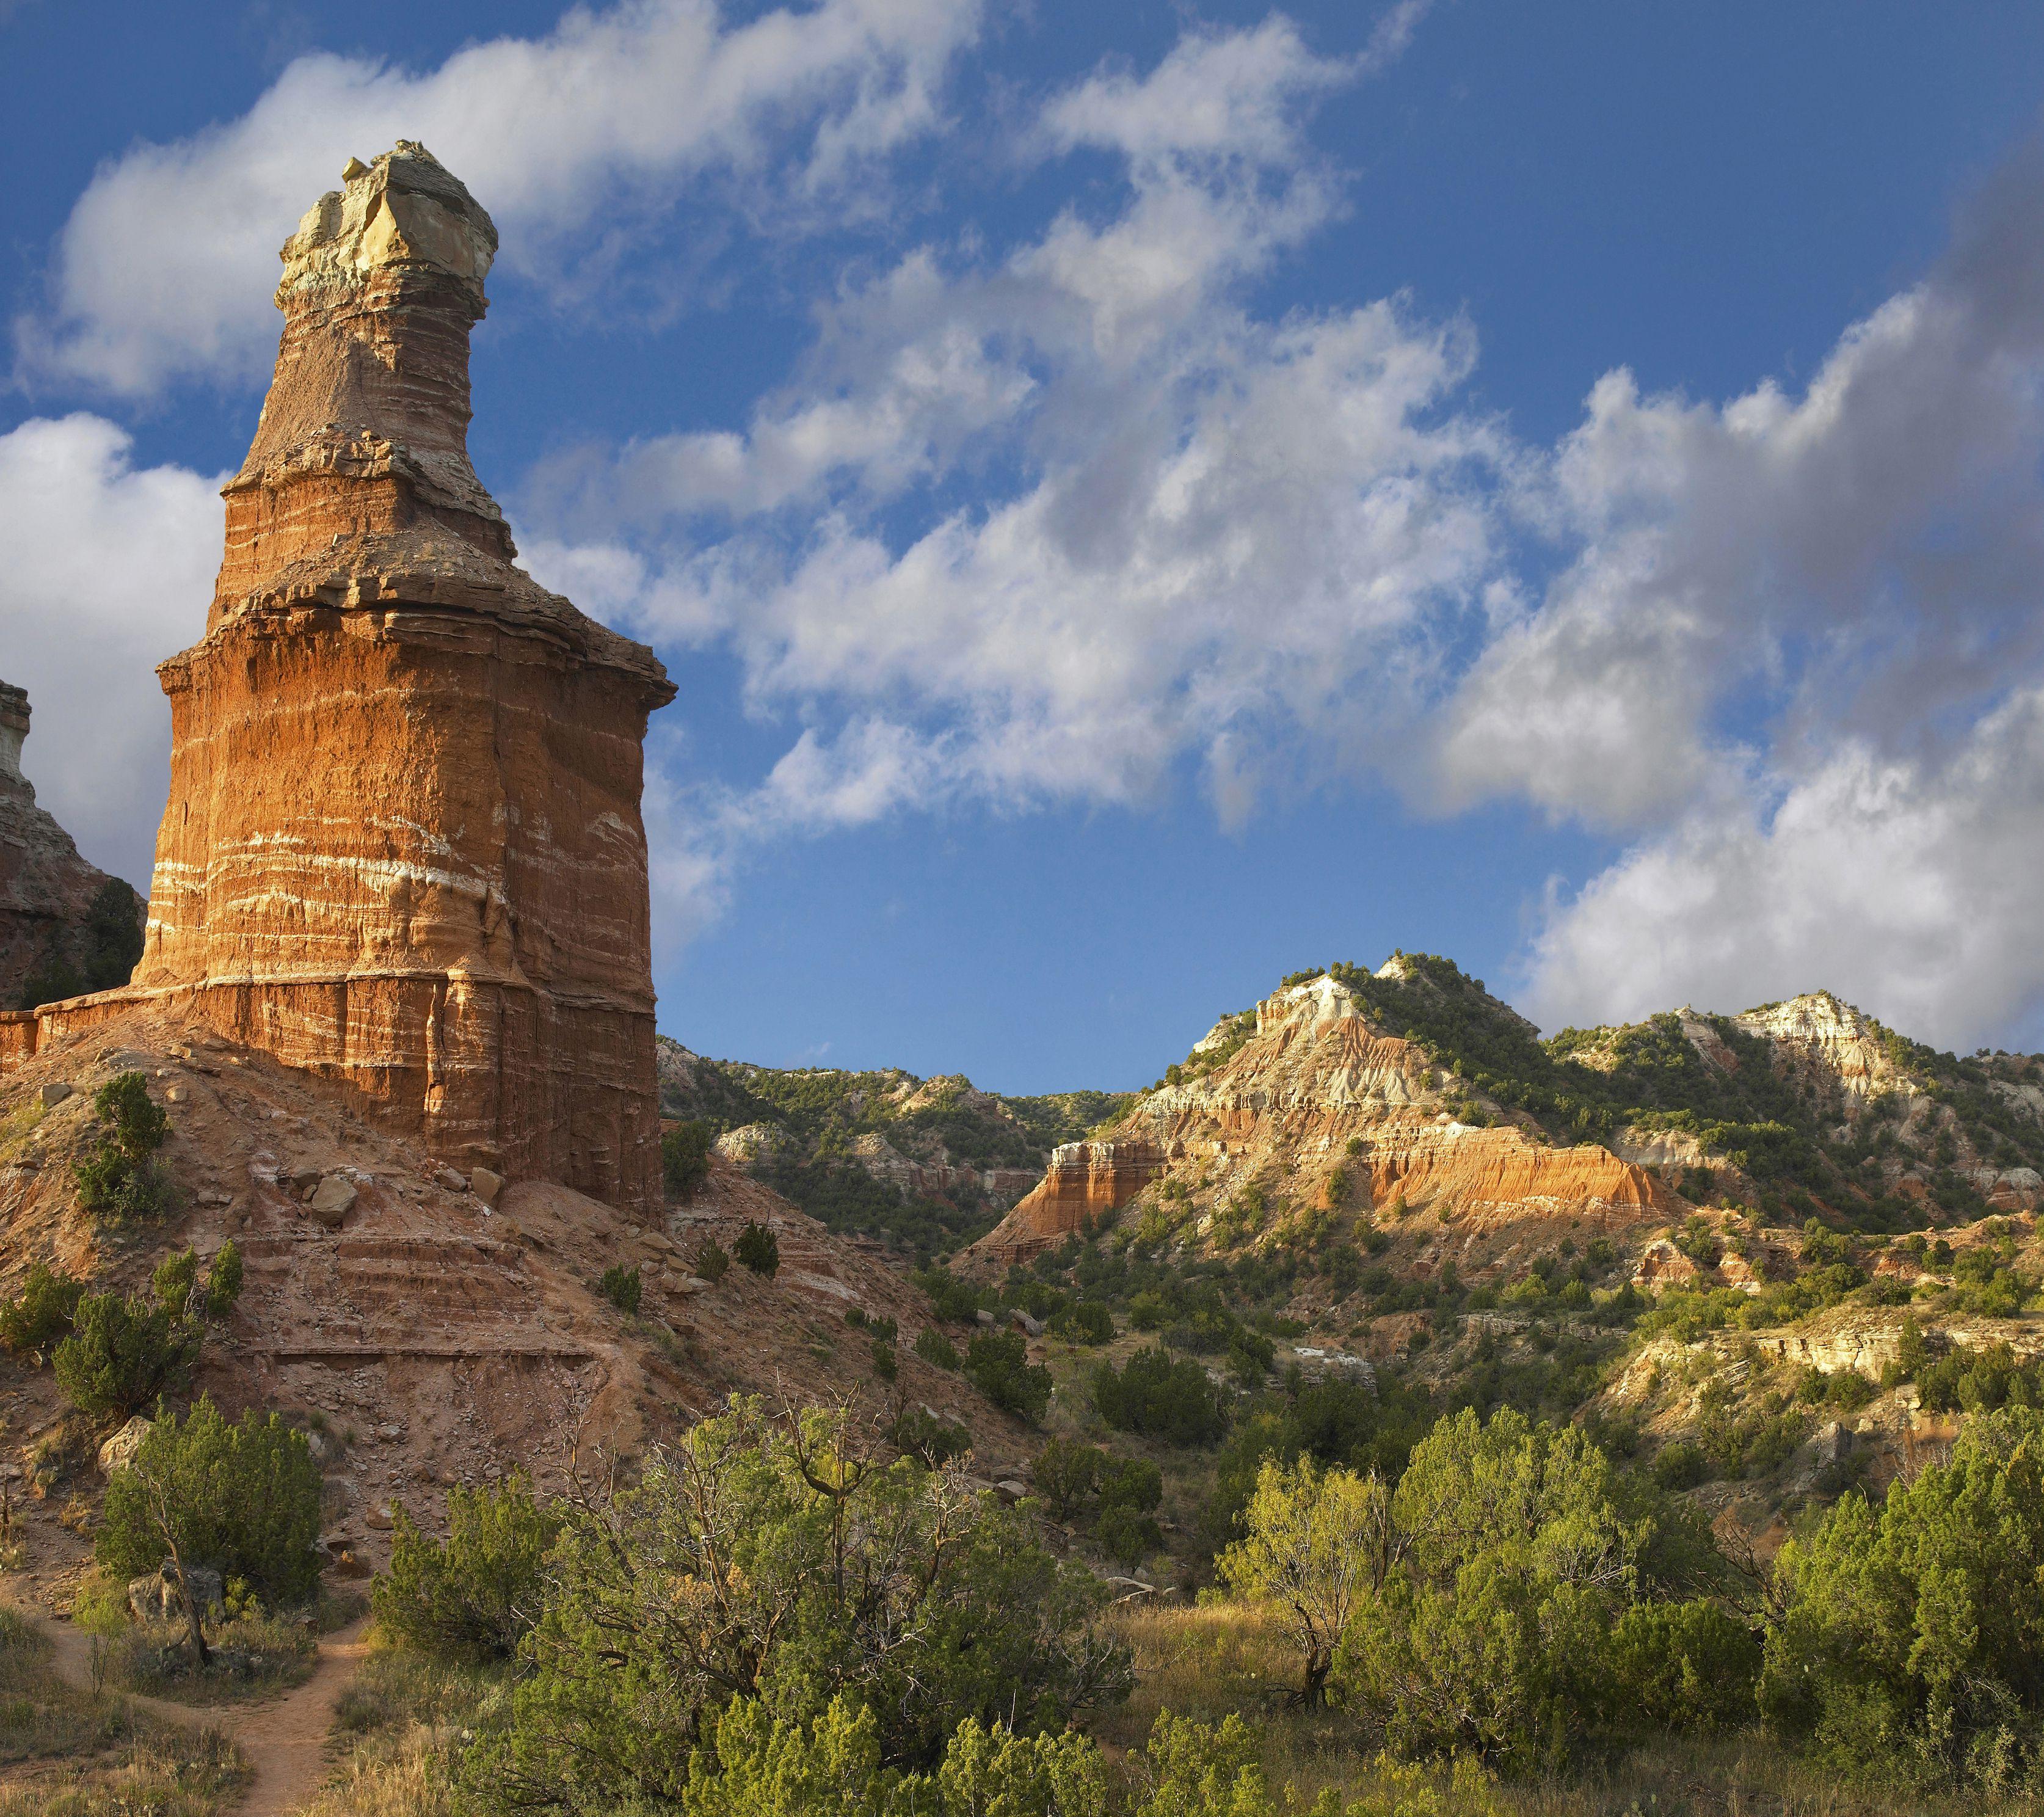 Texas' Palo Duro Canyon State Park